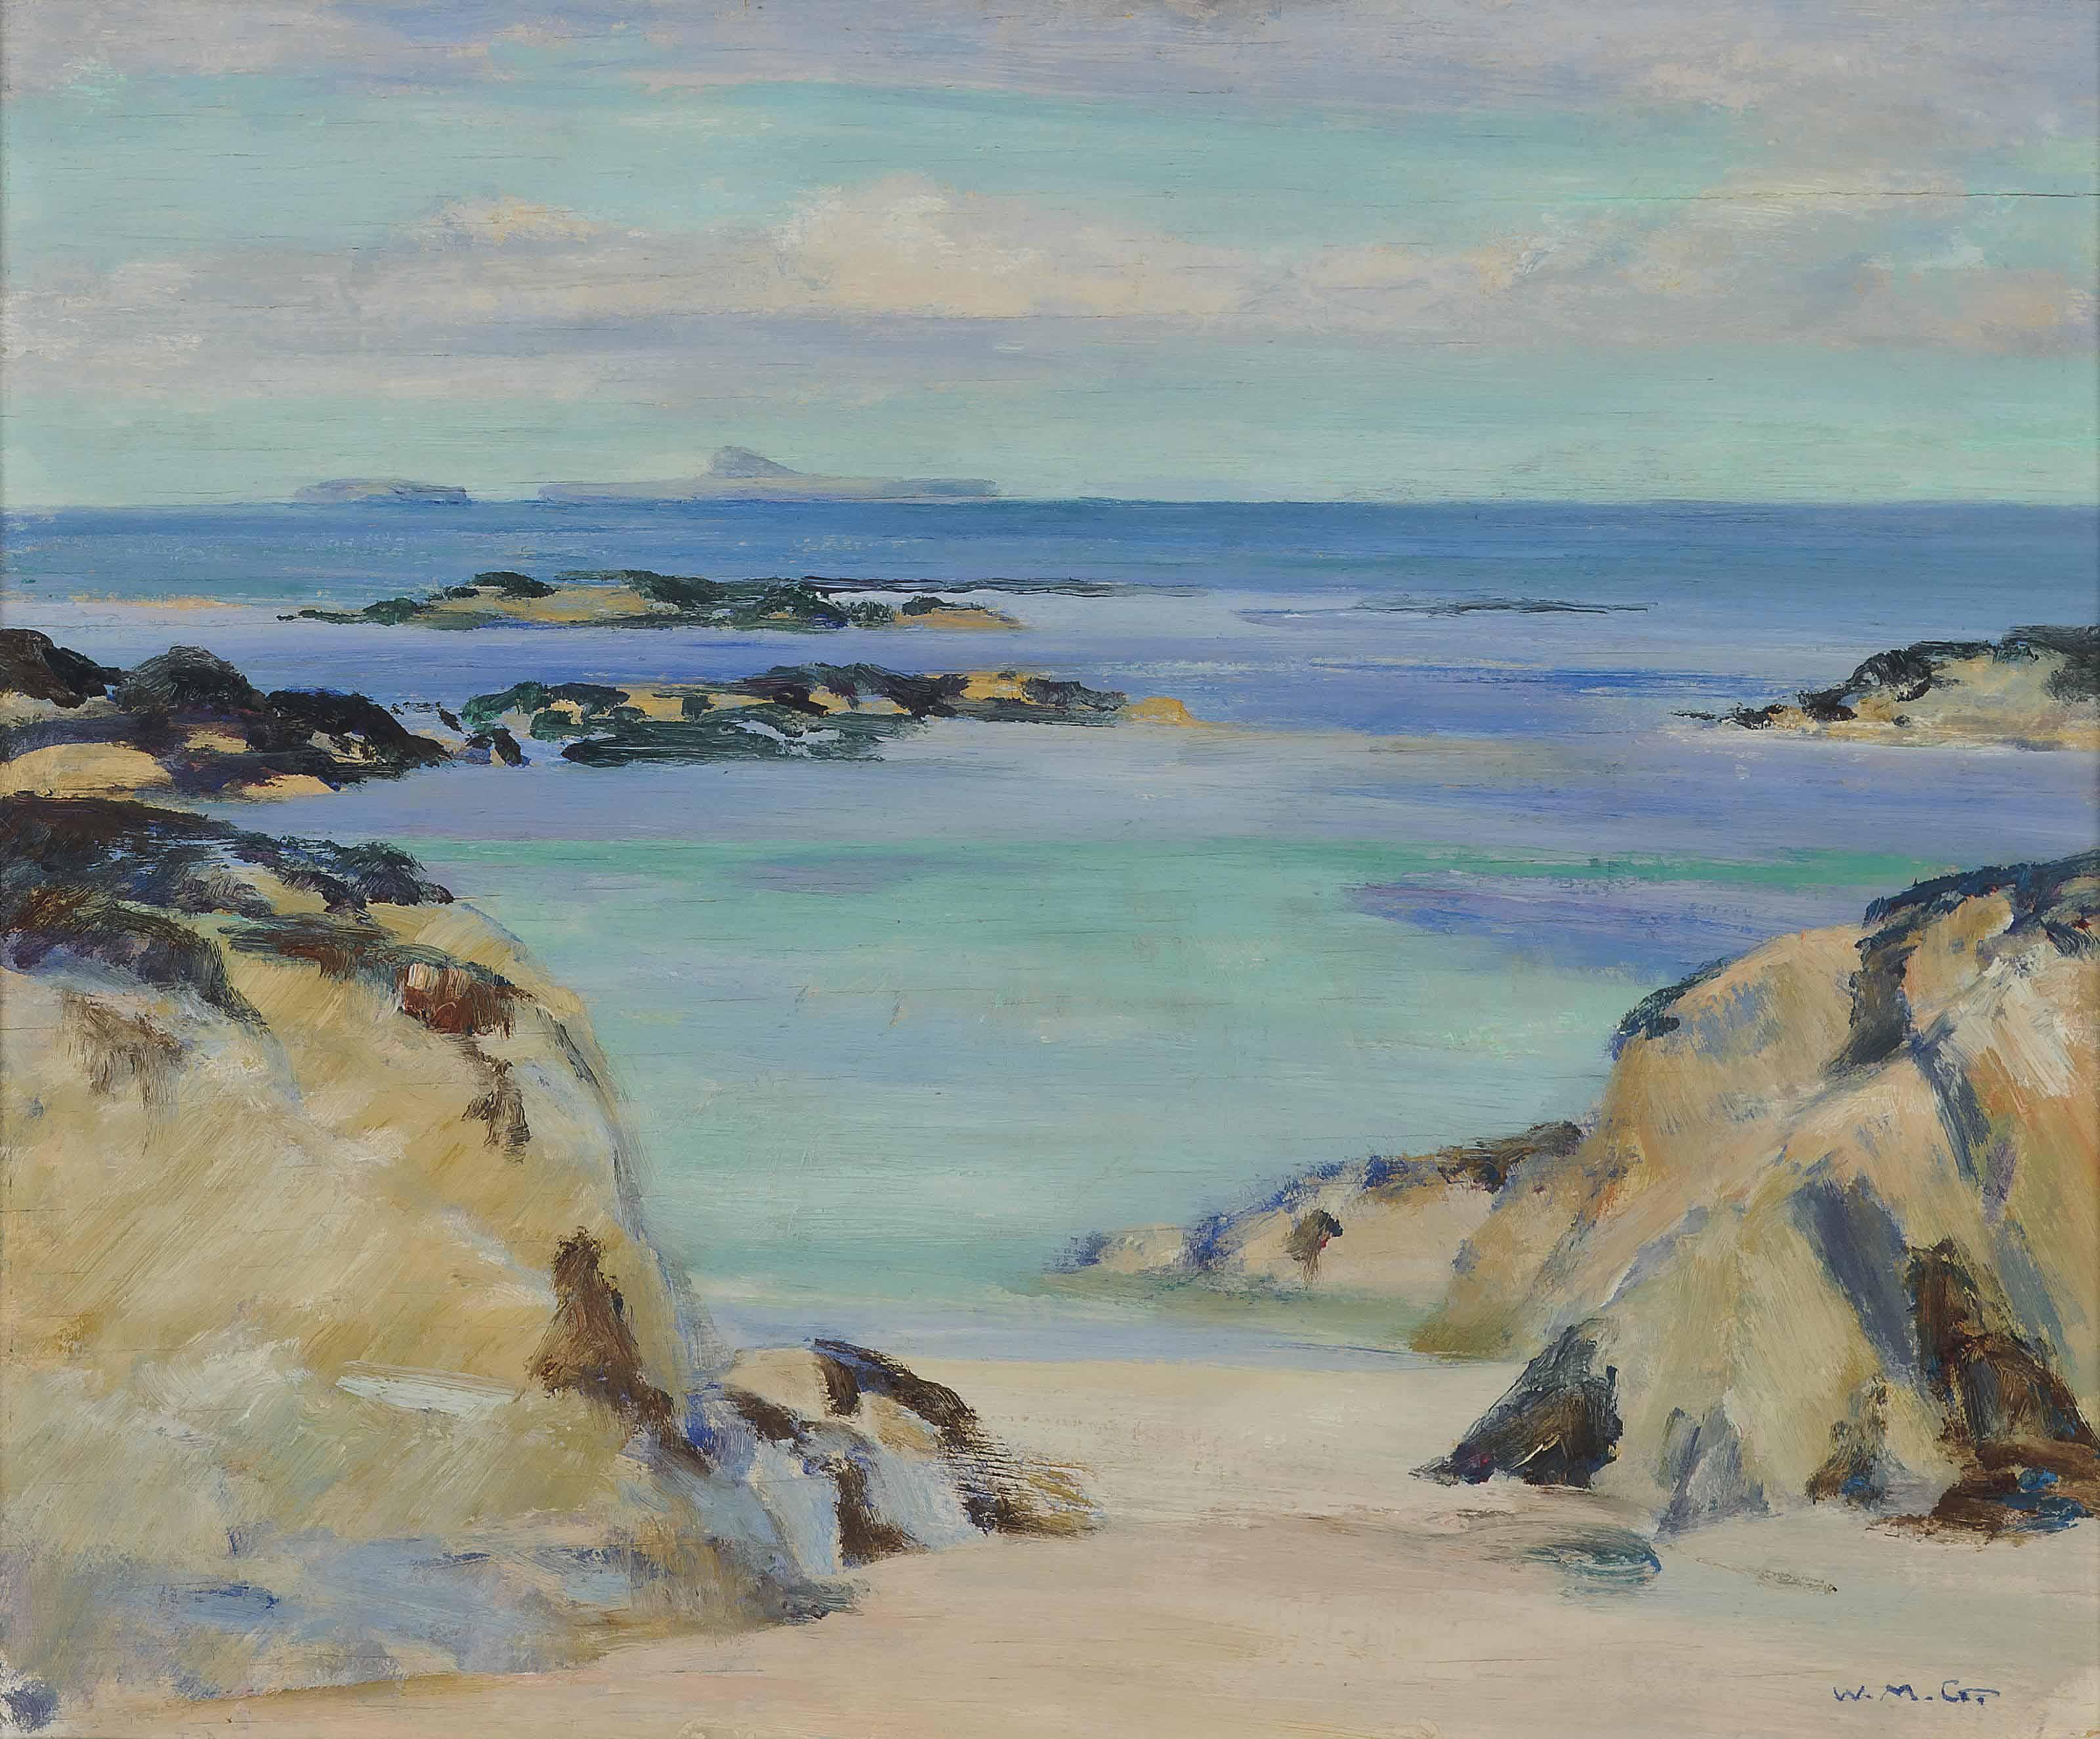 Towards Dutchman's Cap, Iona